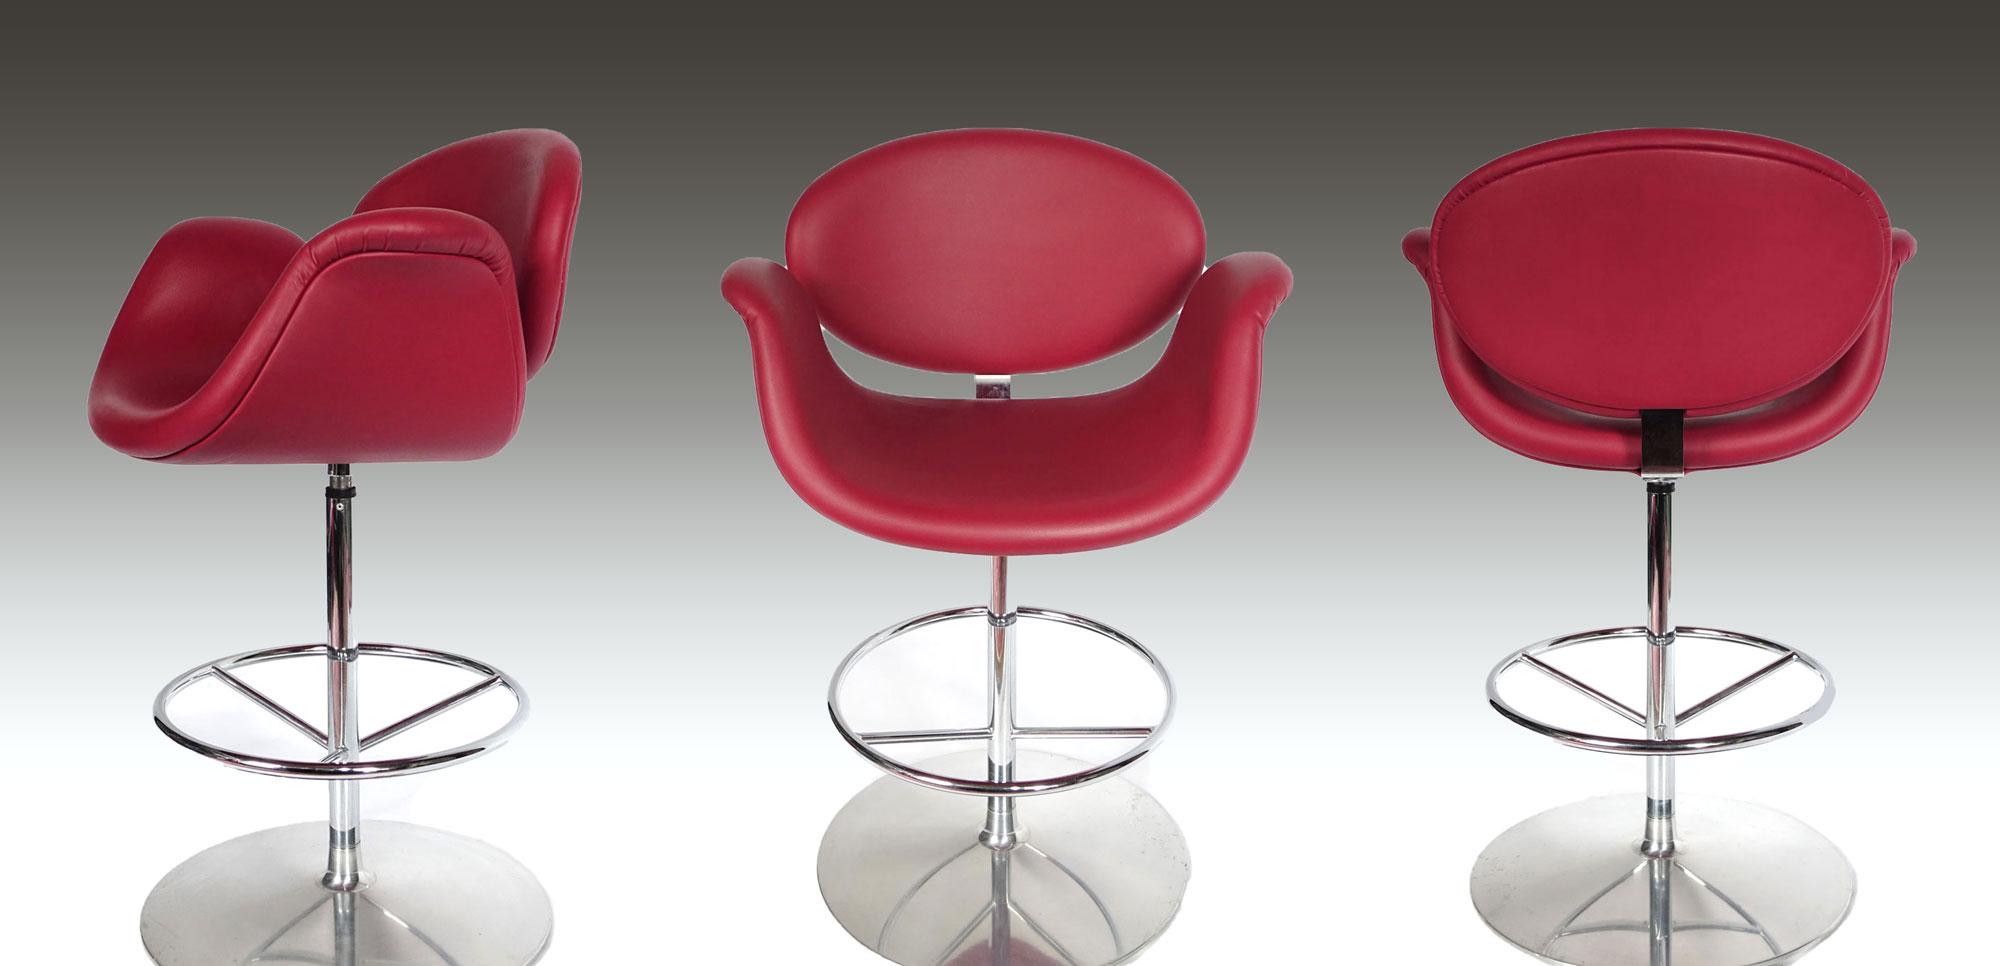 Space Age Furniture Designs